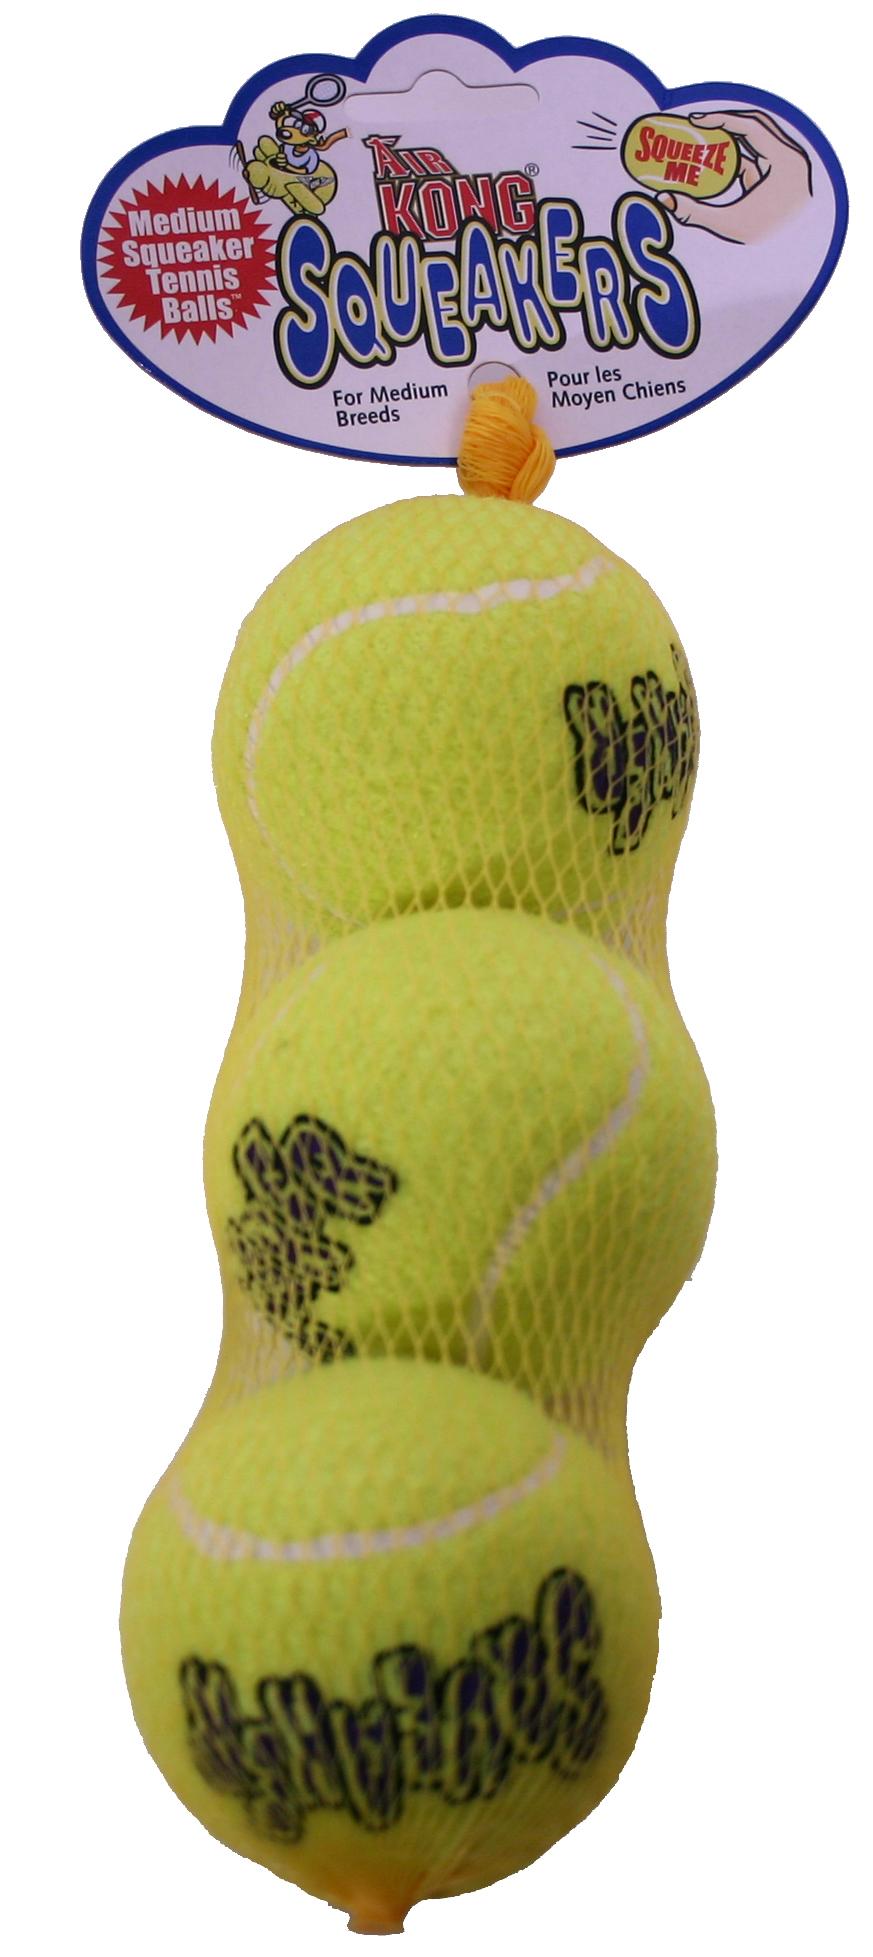 Hundeleke Kong squeakers tennisball